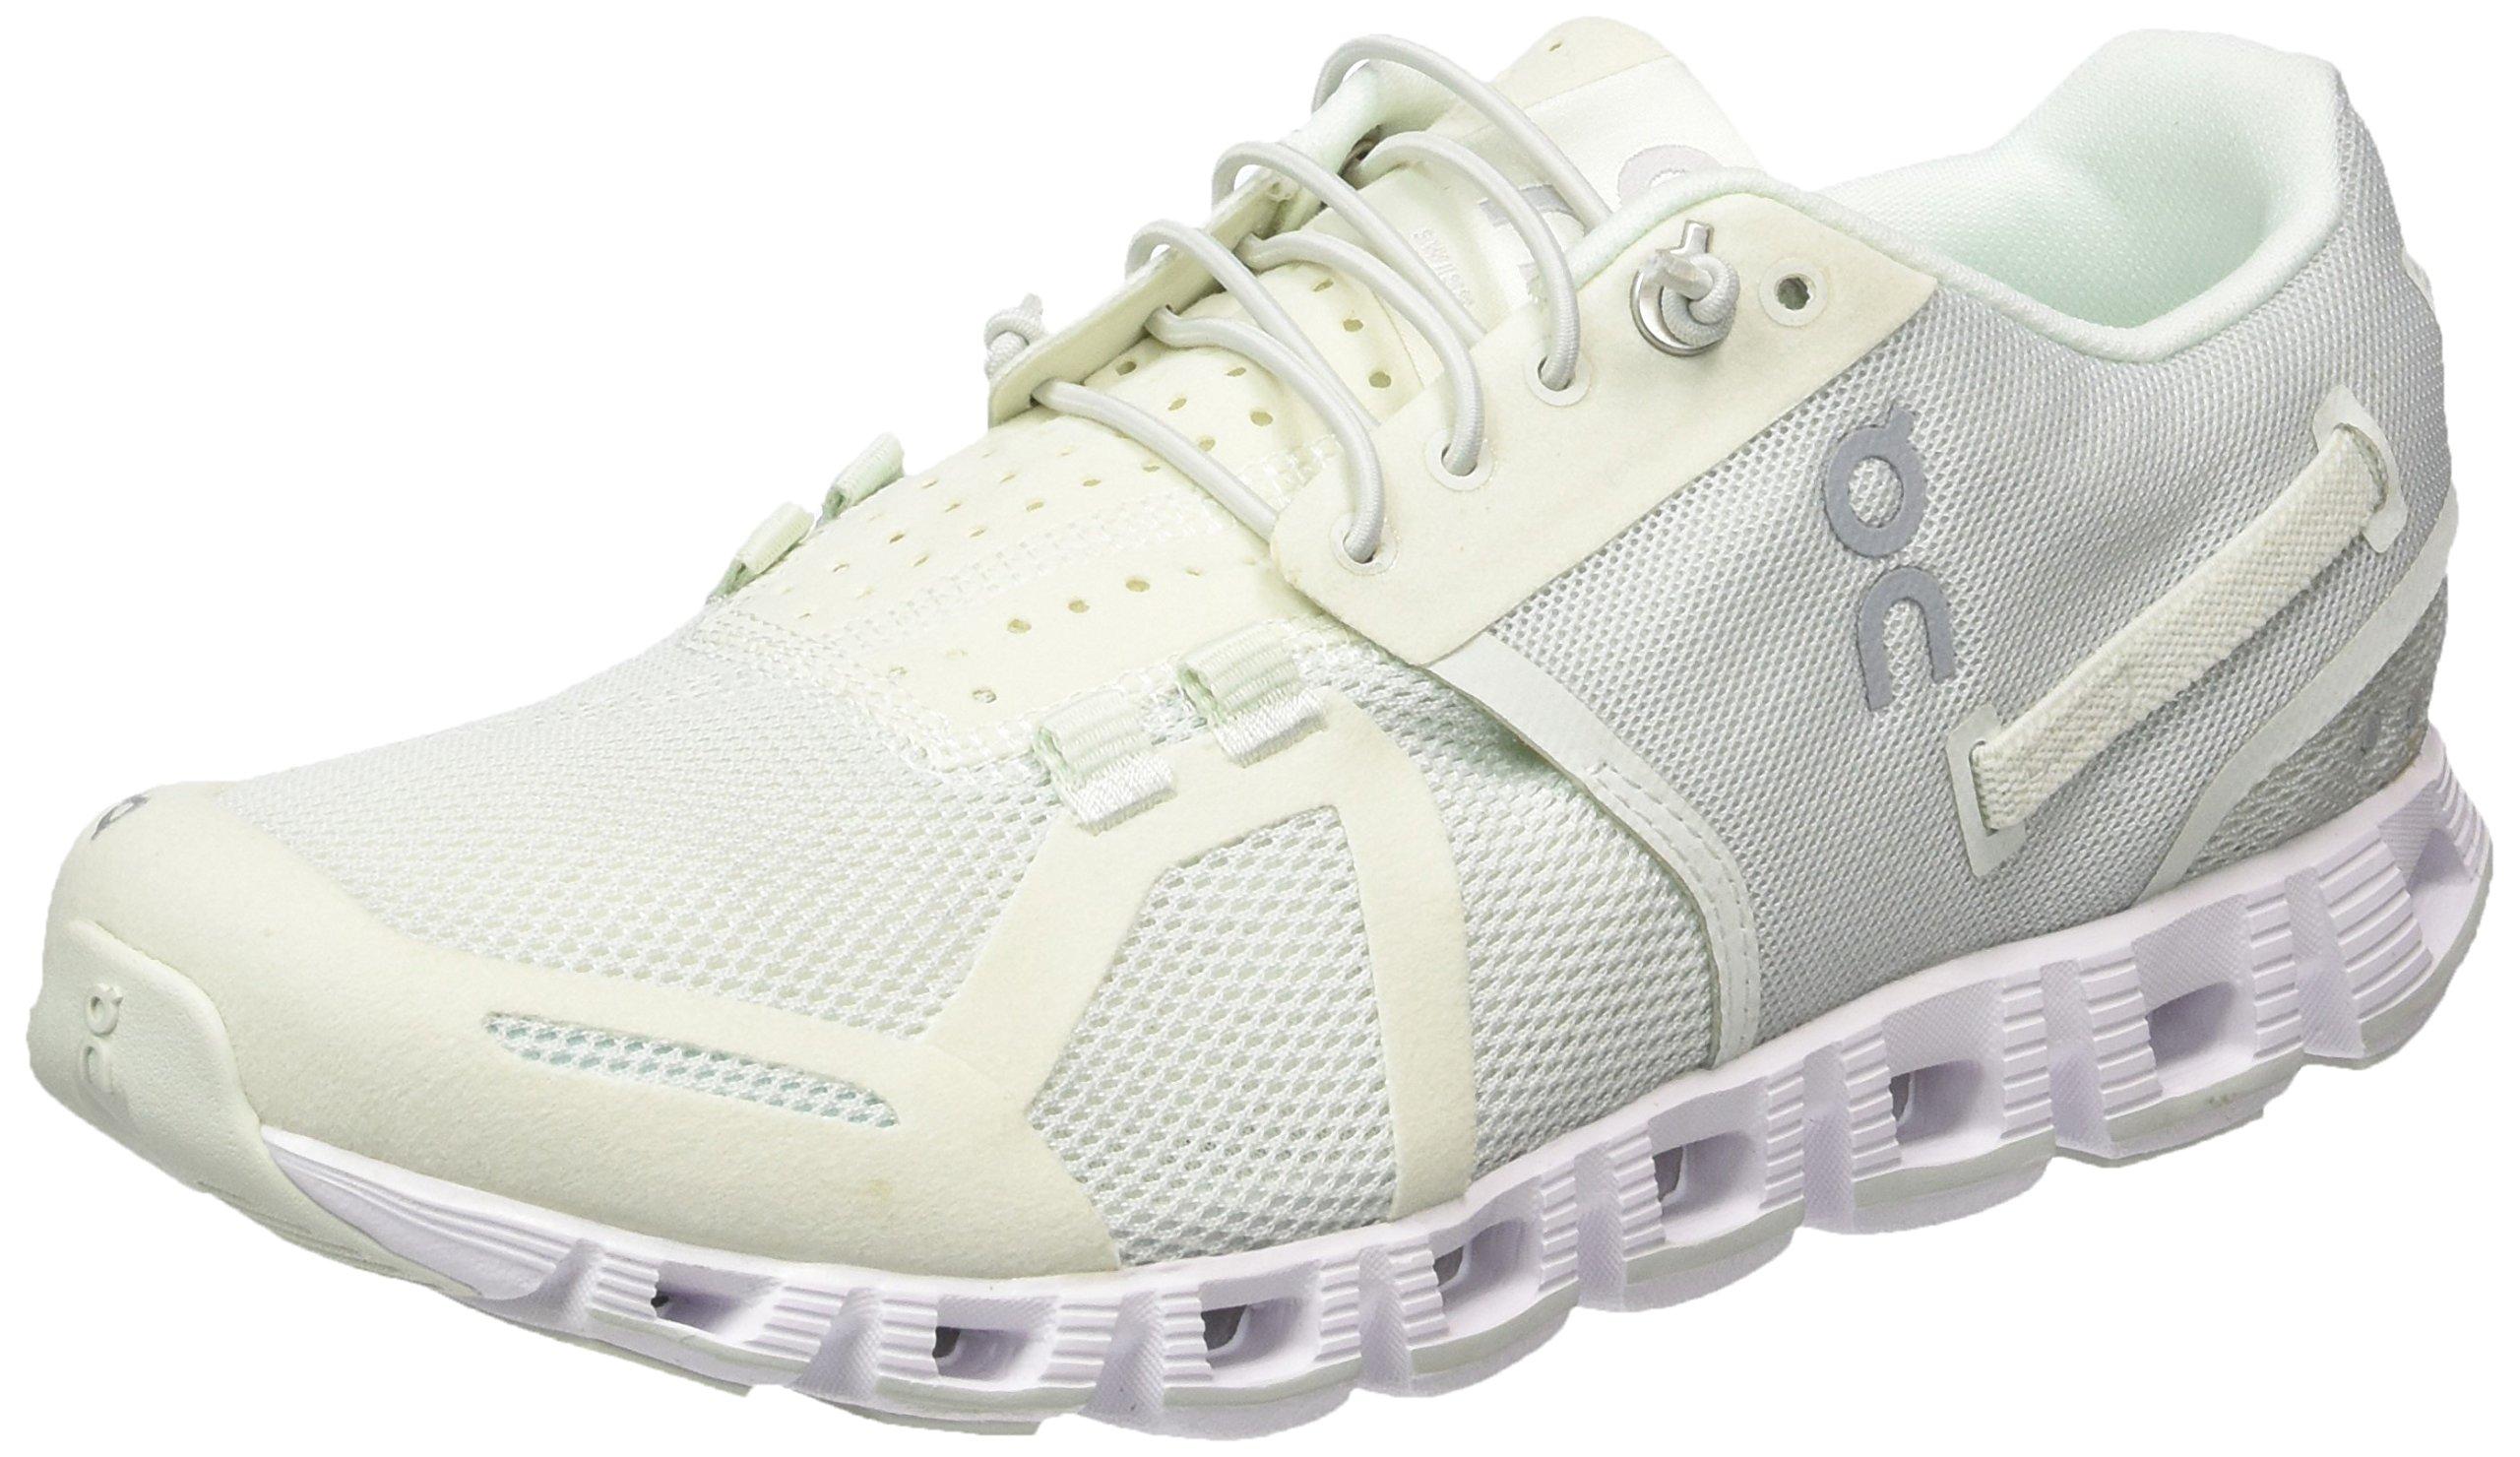 On Women's Running Cloud Sneaker, Ice/White - 5.5 B(M) US